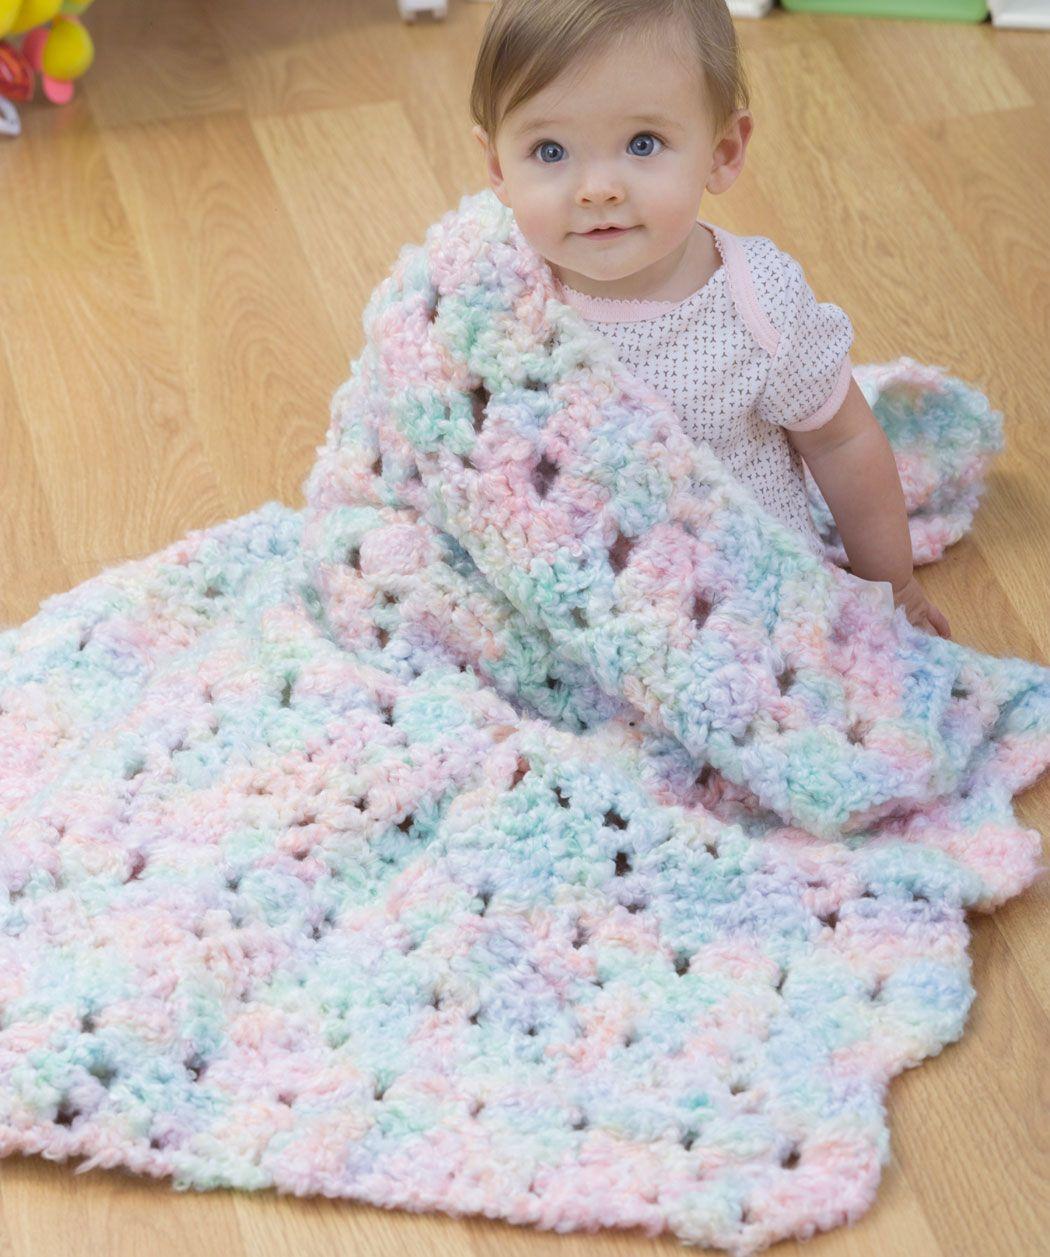 Sleepytime blanket crochet pattern creative ideas for my sleepytime blanket crochet pattern bankloansurffo Choice Image